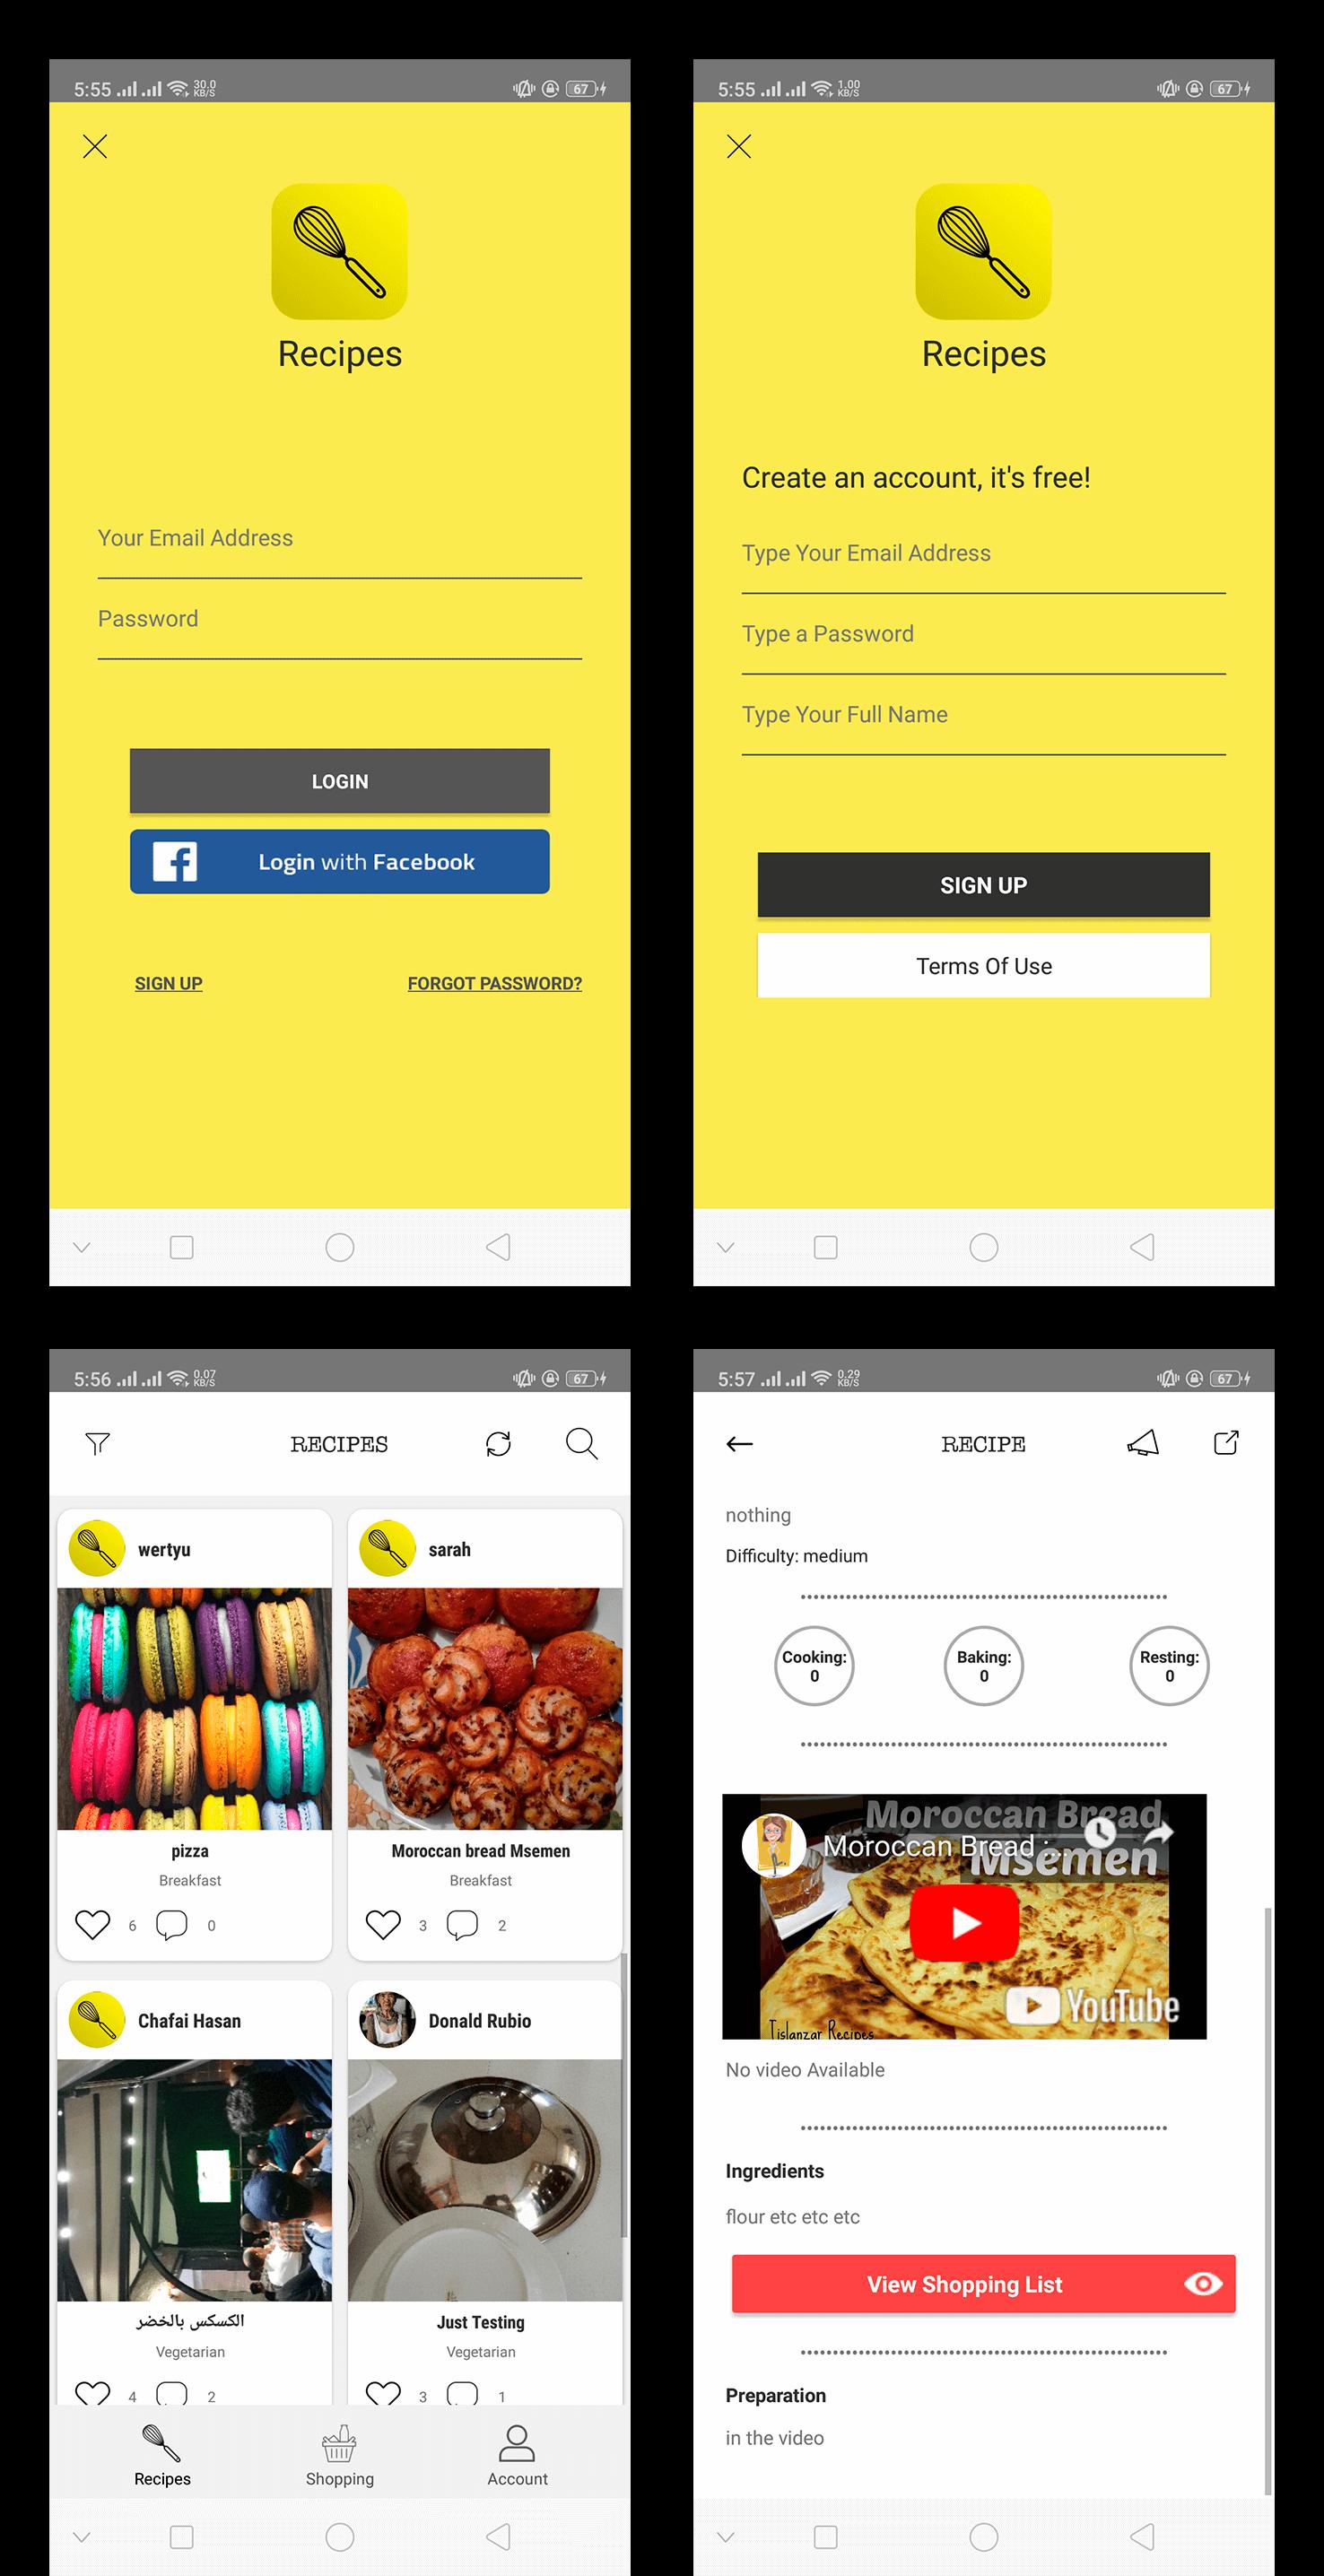 Recipes | Images 2